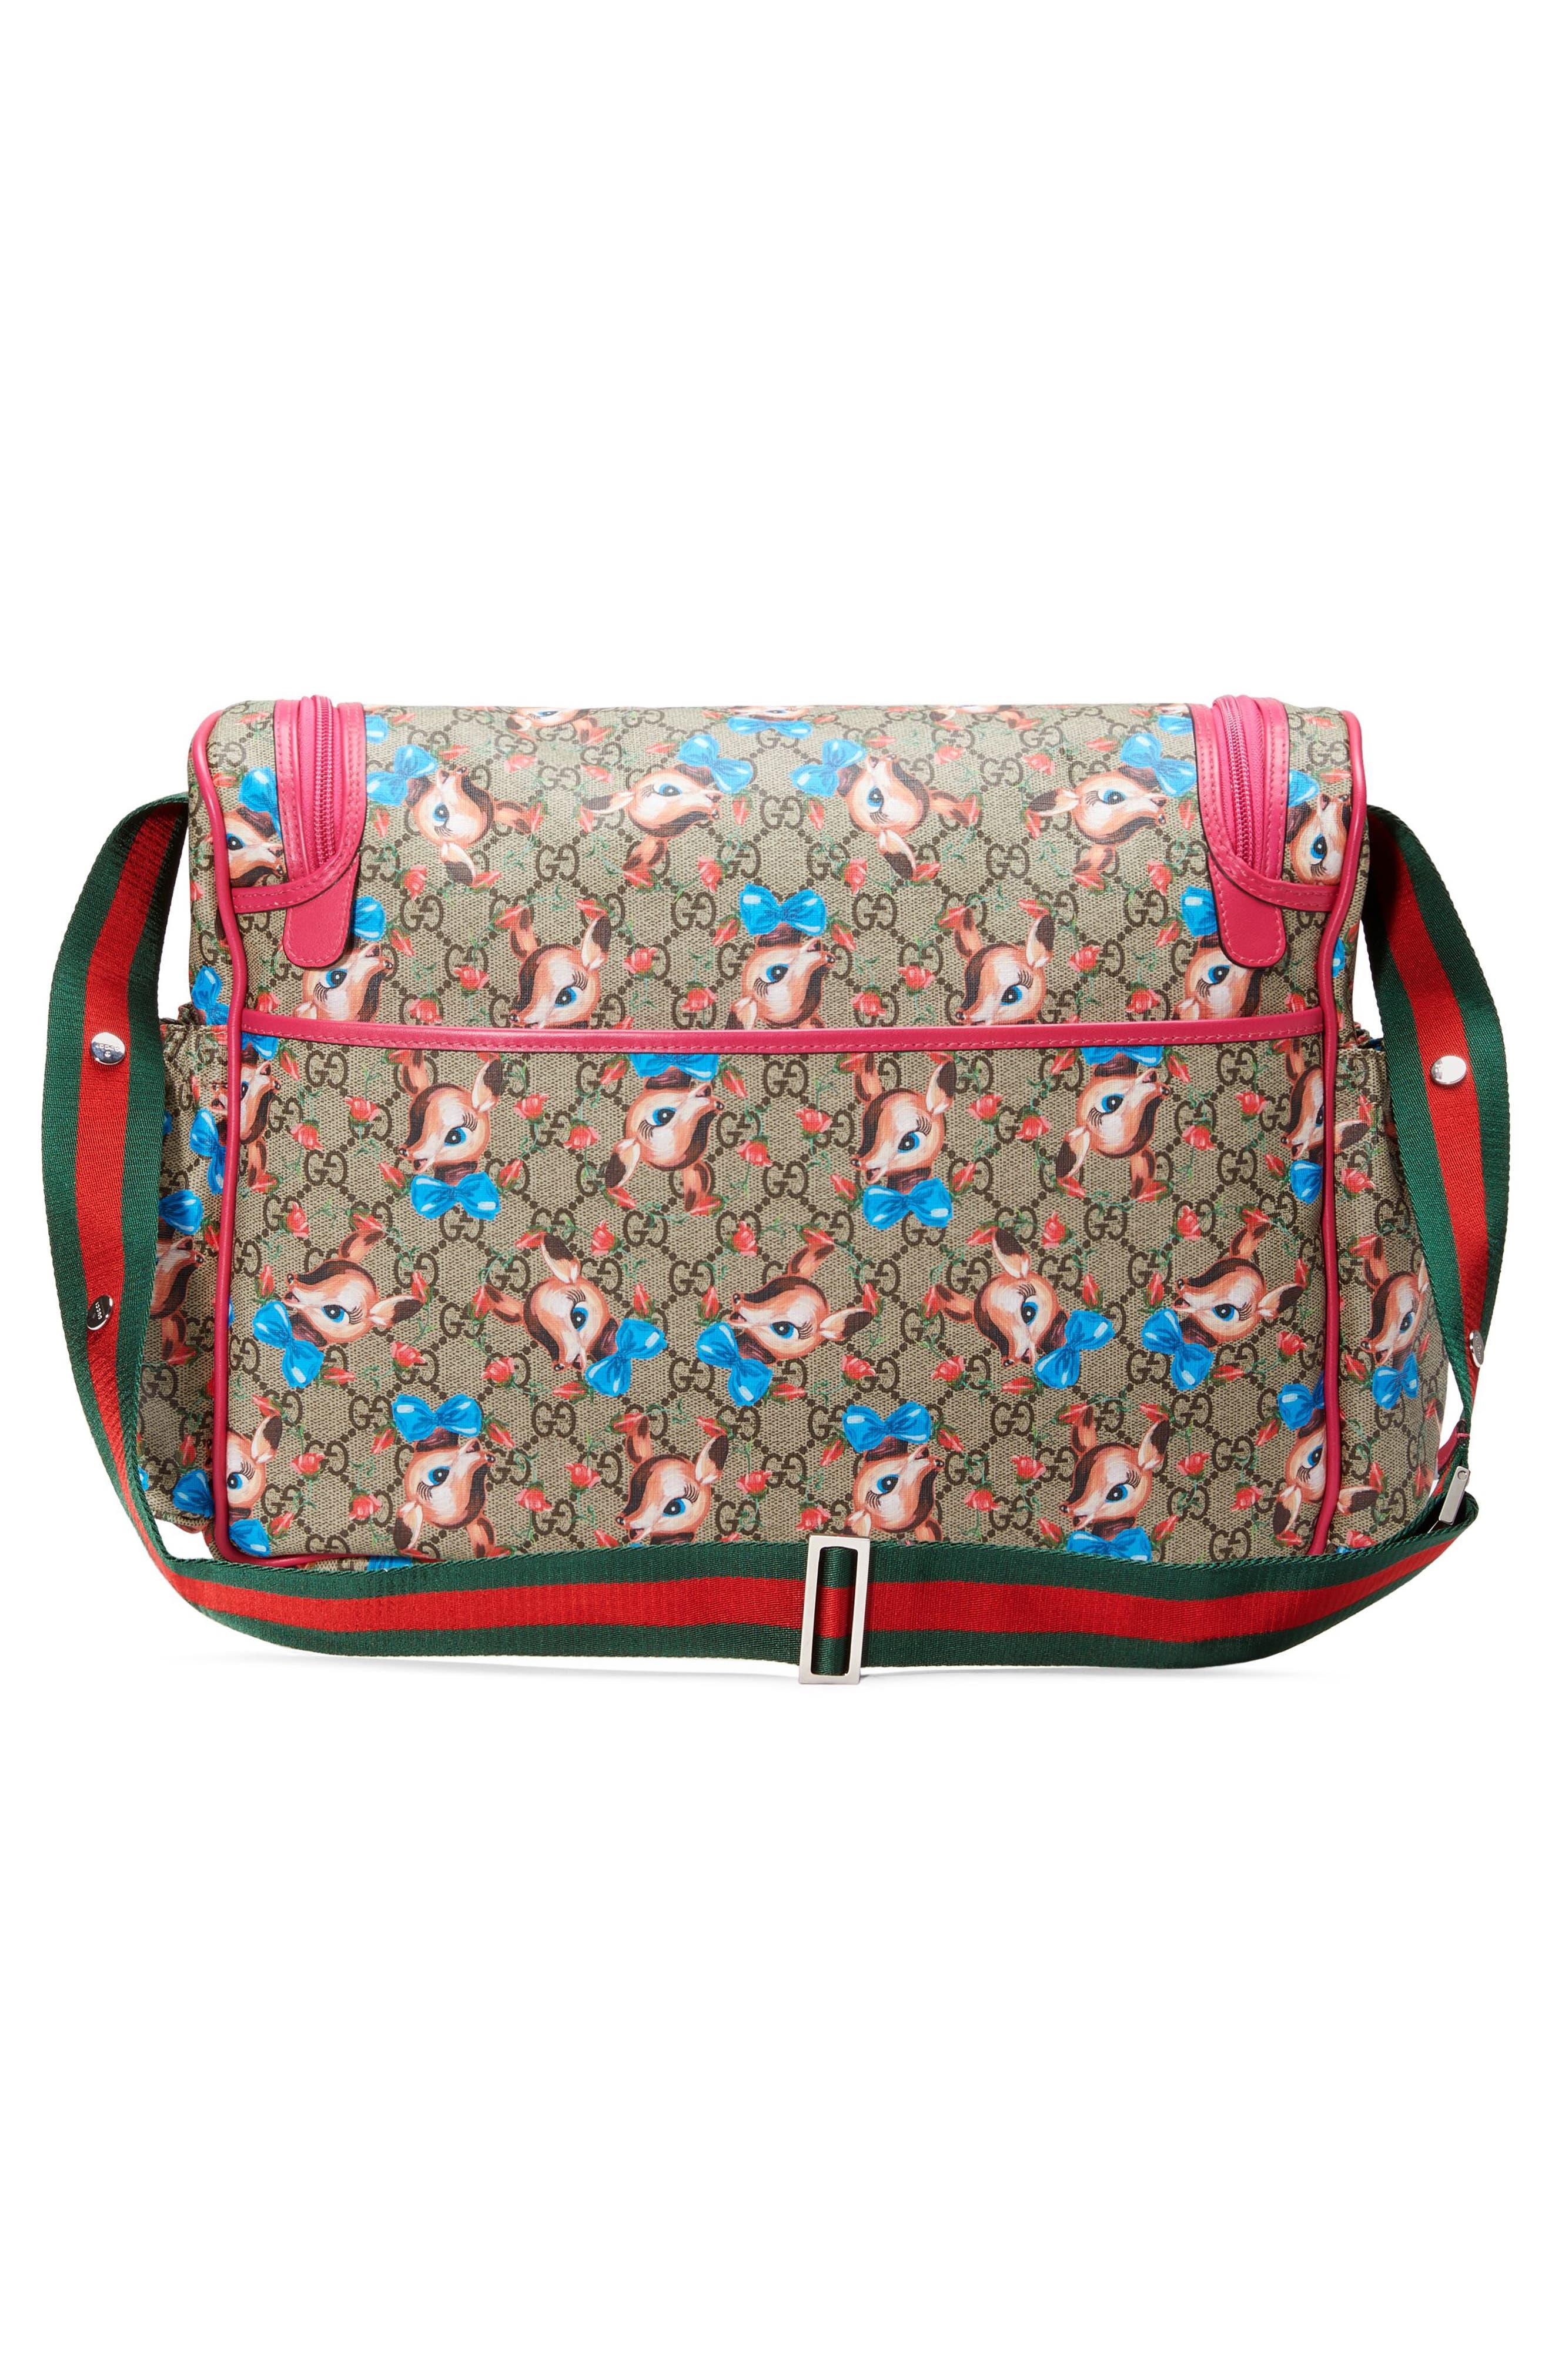 Deer & Rose Bud GG Supreme Canvas Diaper Bag,                             Alternate thumbnail 2, color,                             250